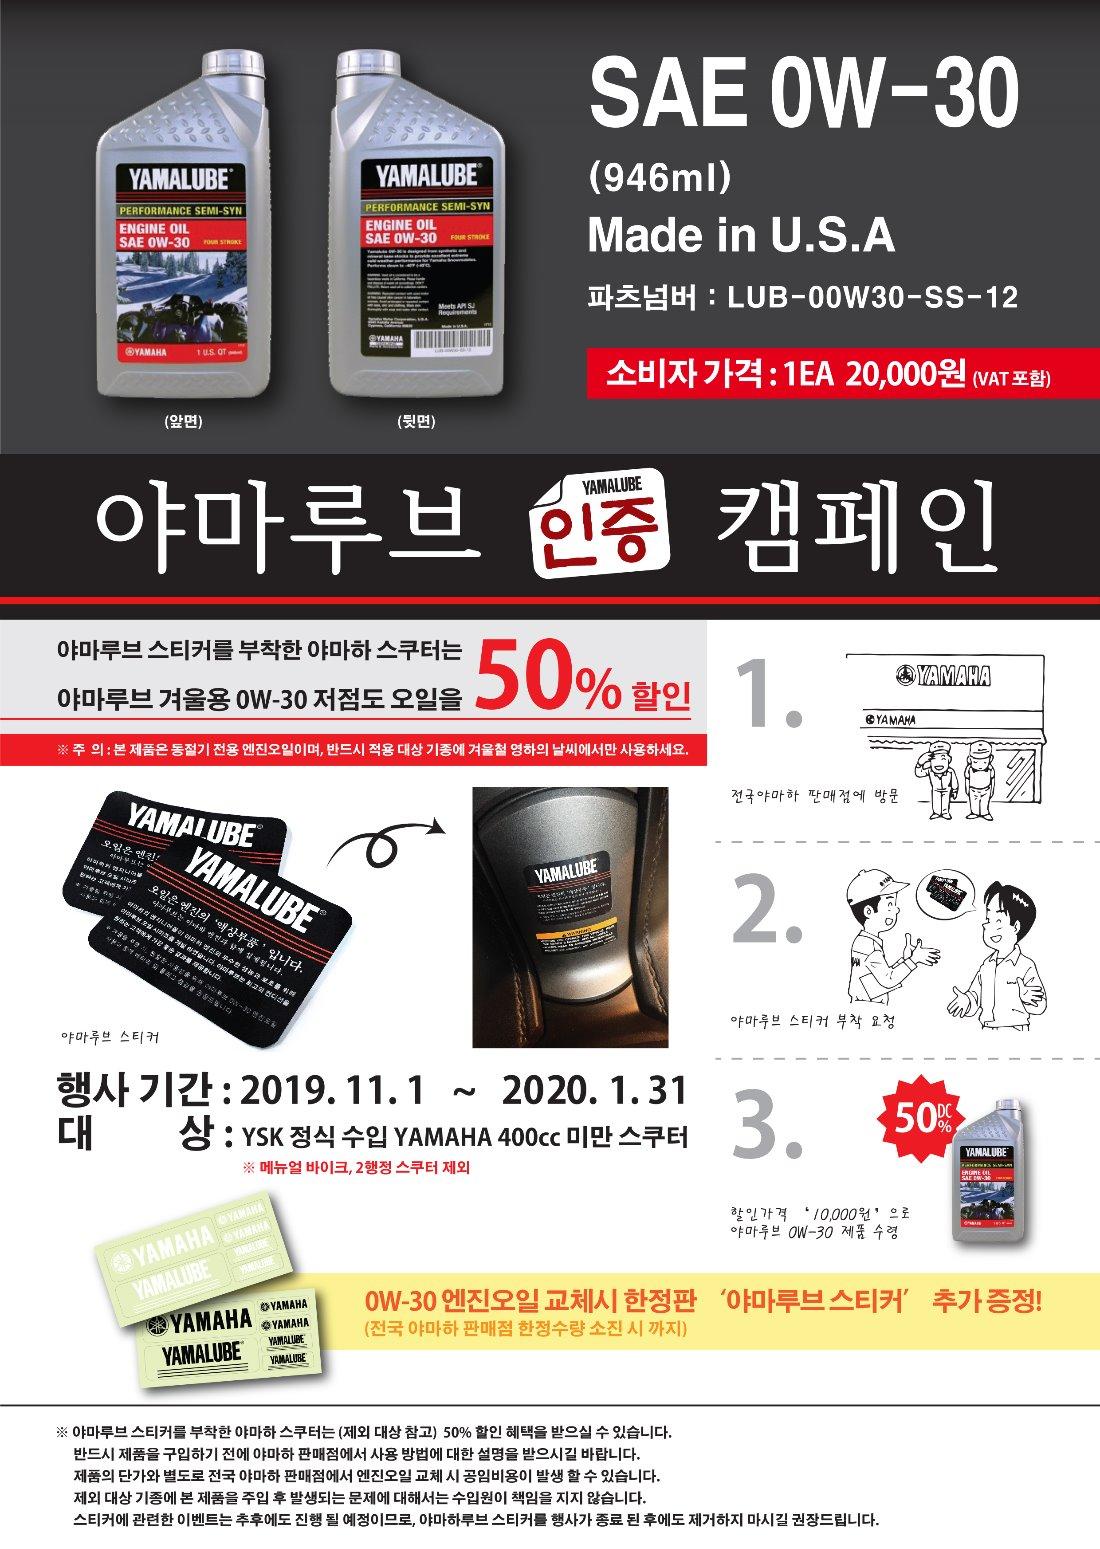 2019 0w-30 인증 캠페인 광고시안-2.jpg